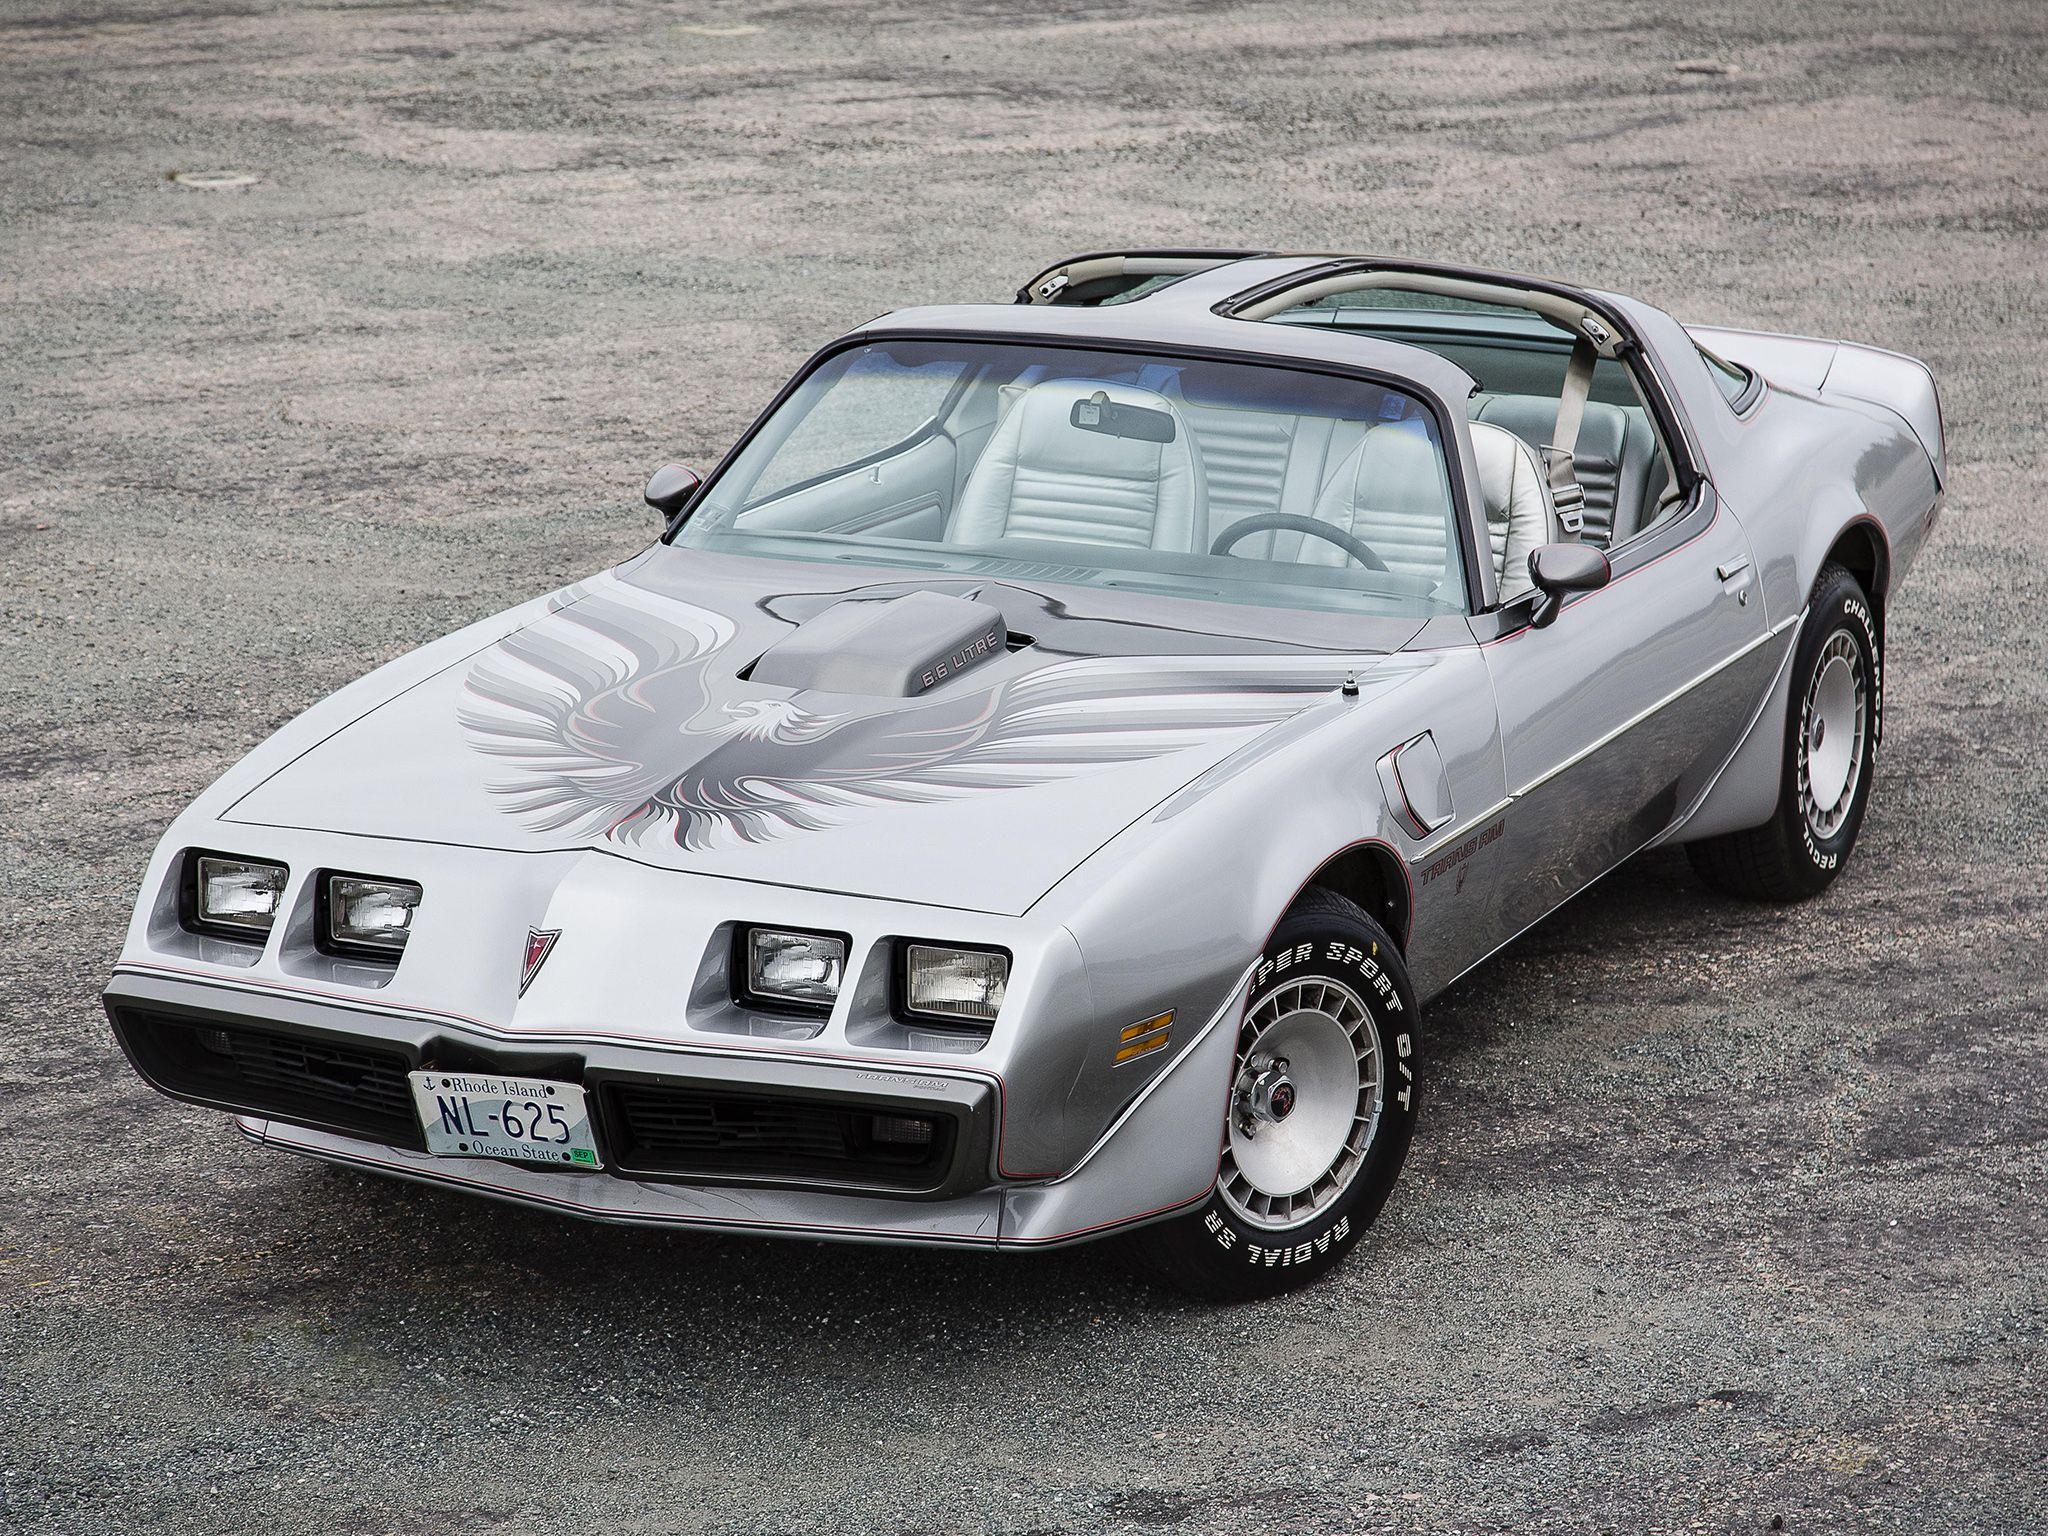 1979 Pontiac Firebird Trans Am 6 6 10th Anniversary